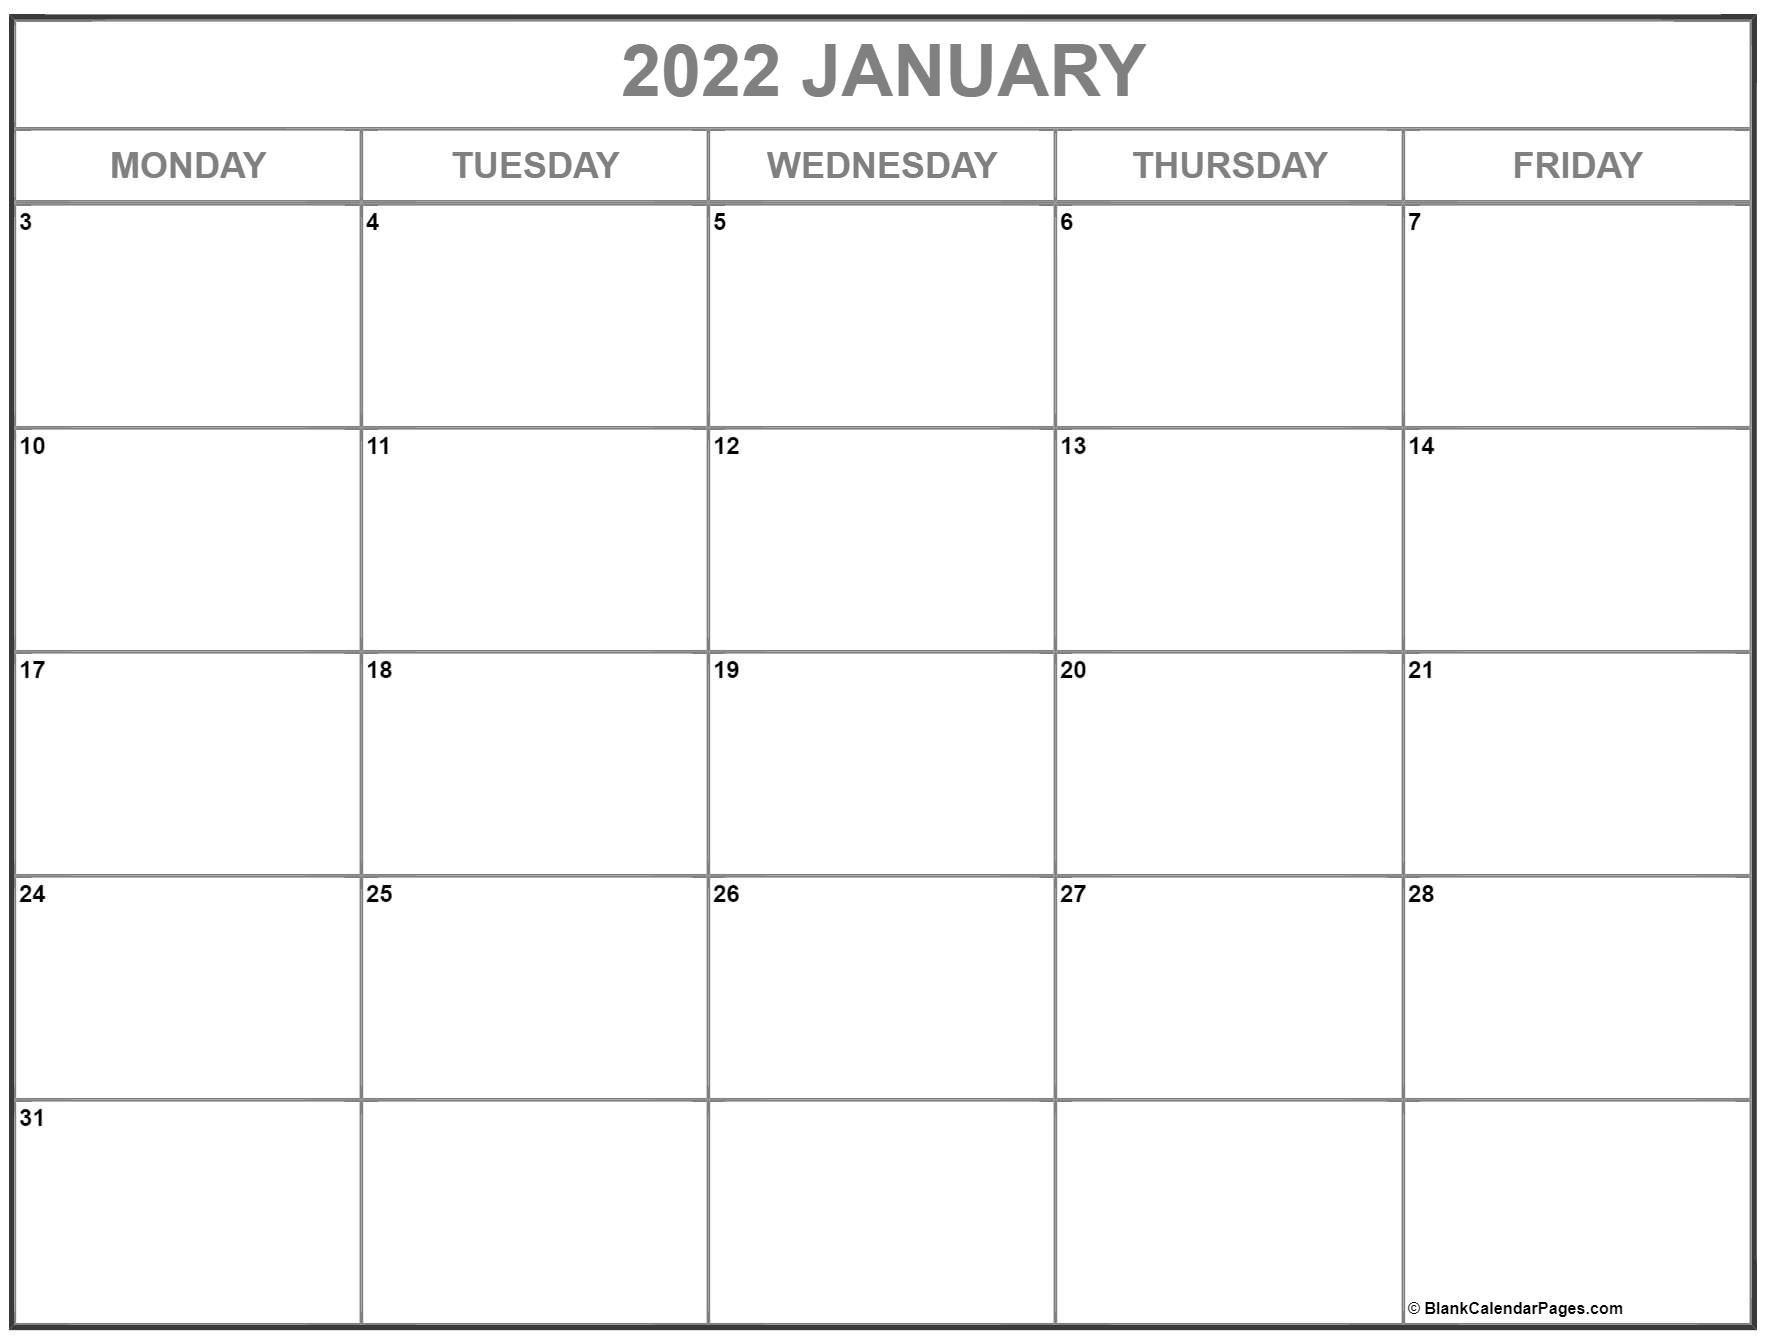 January 2022 Monday Calendar | Monday To Sunday Monday Through Friday Calendar Monthly